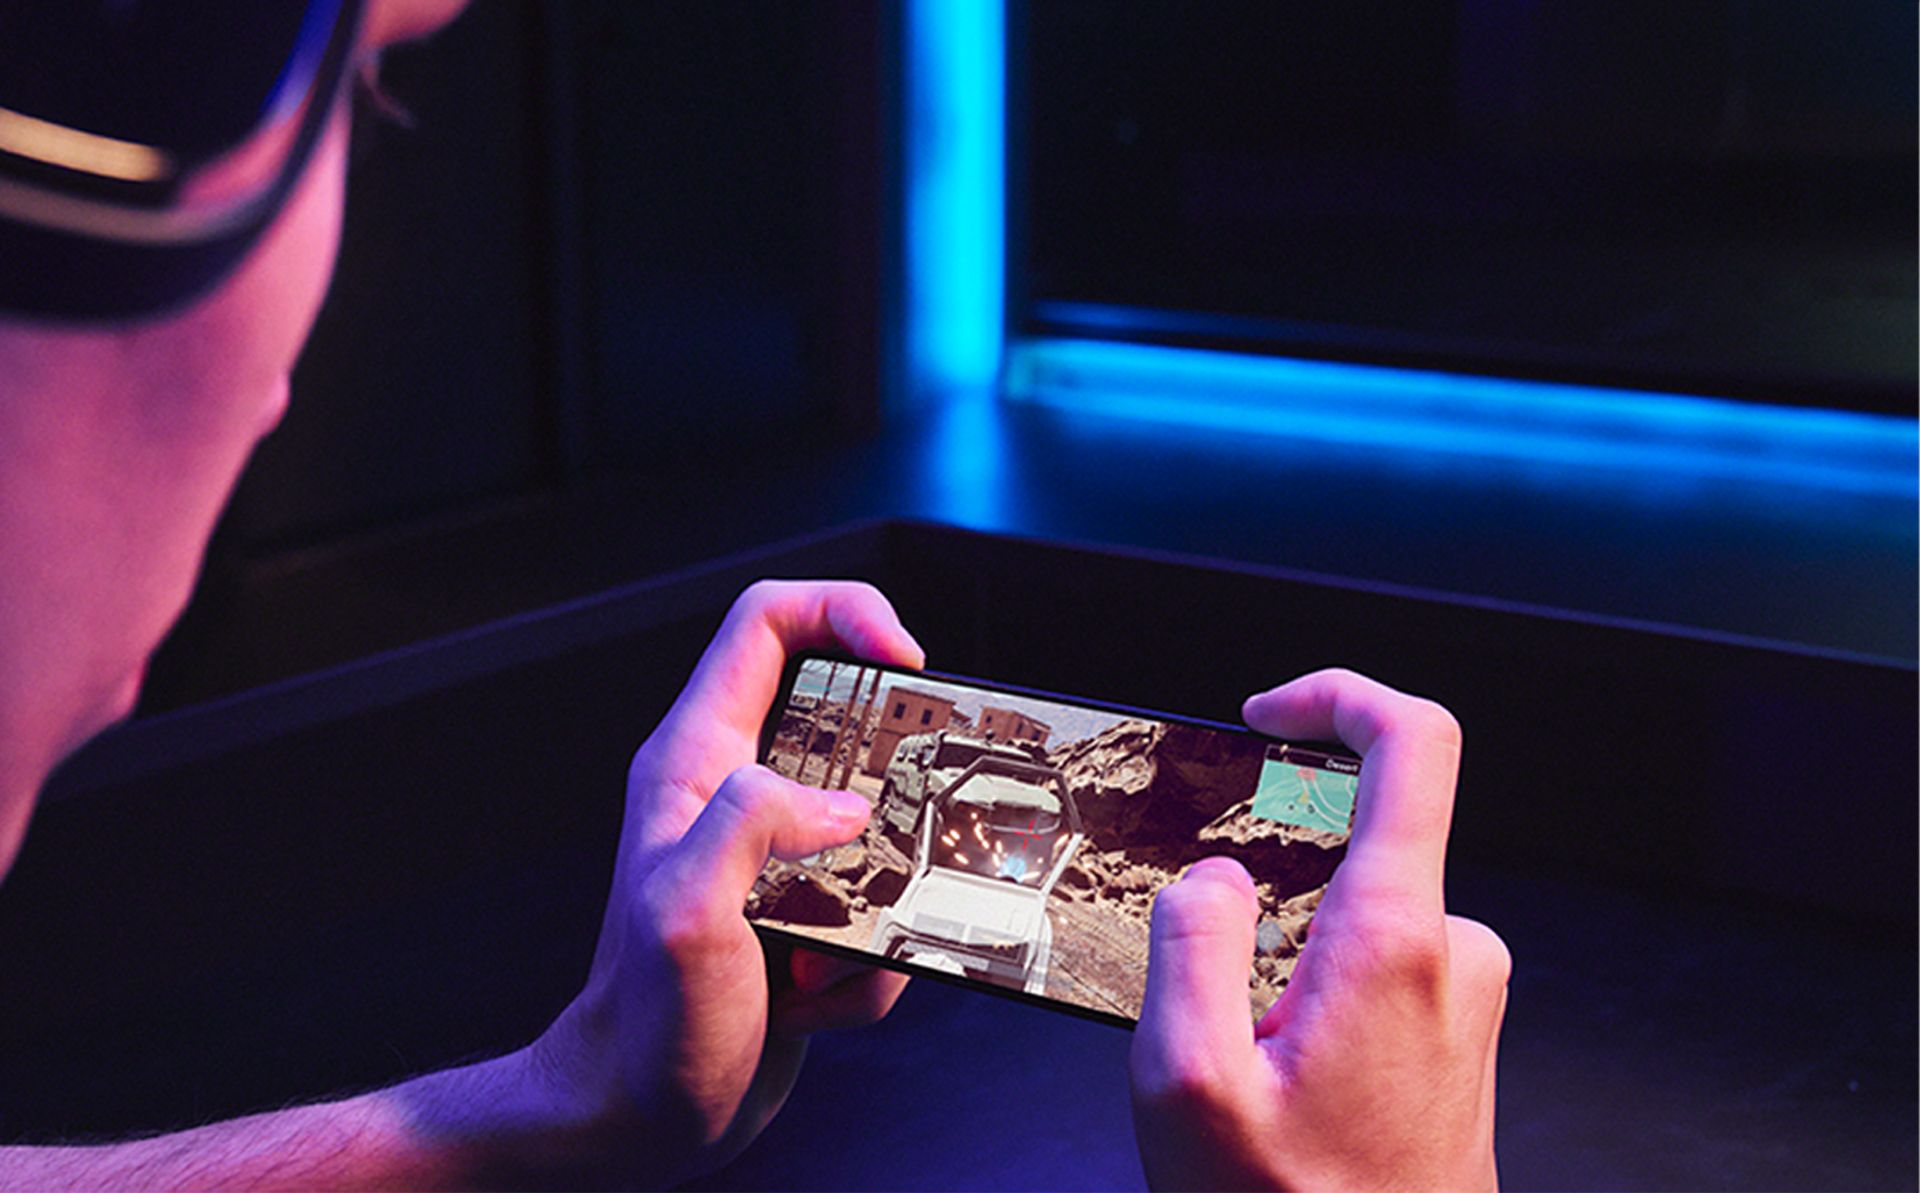 Xperia 1 IIIのゲームイメージ